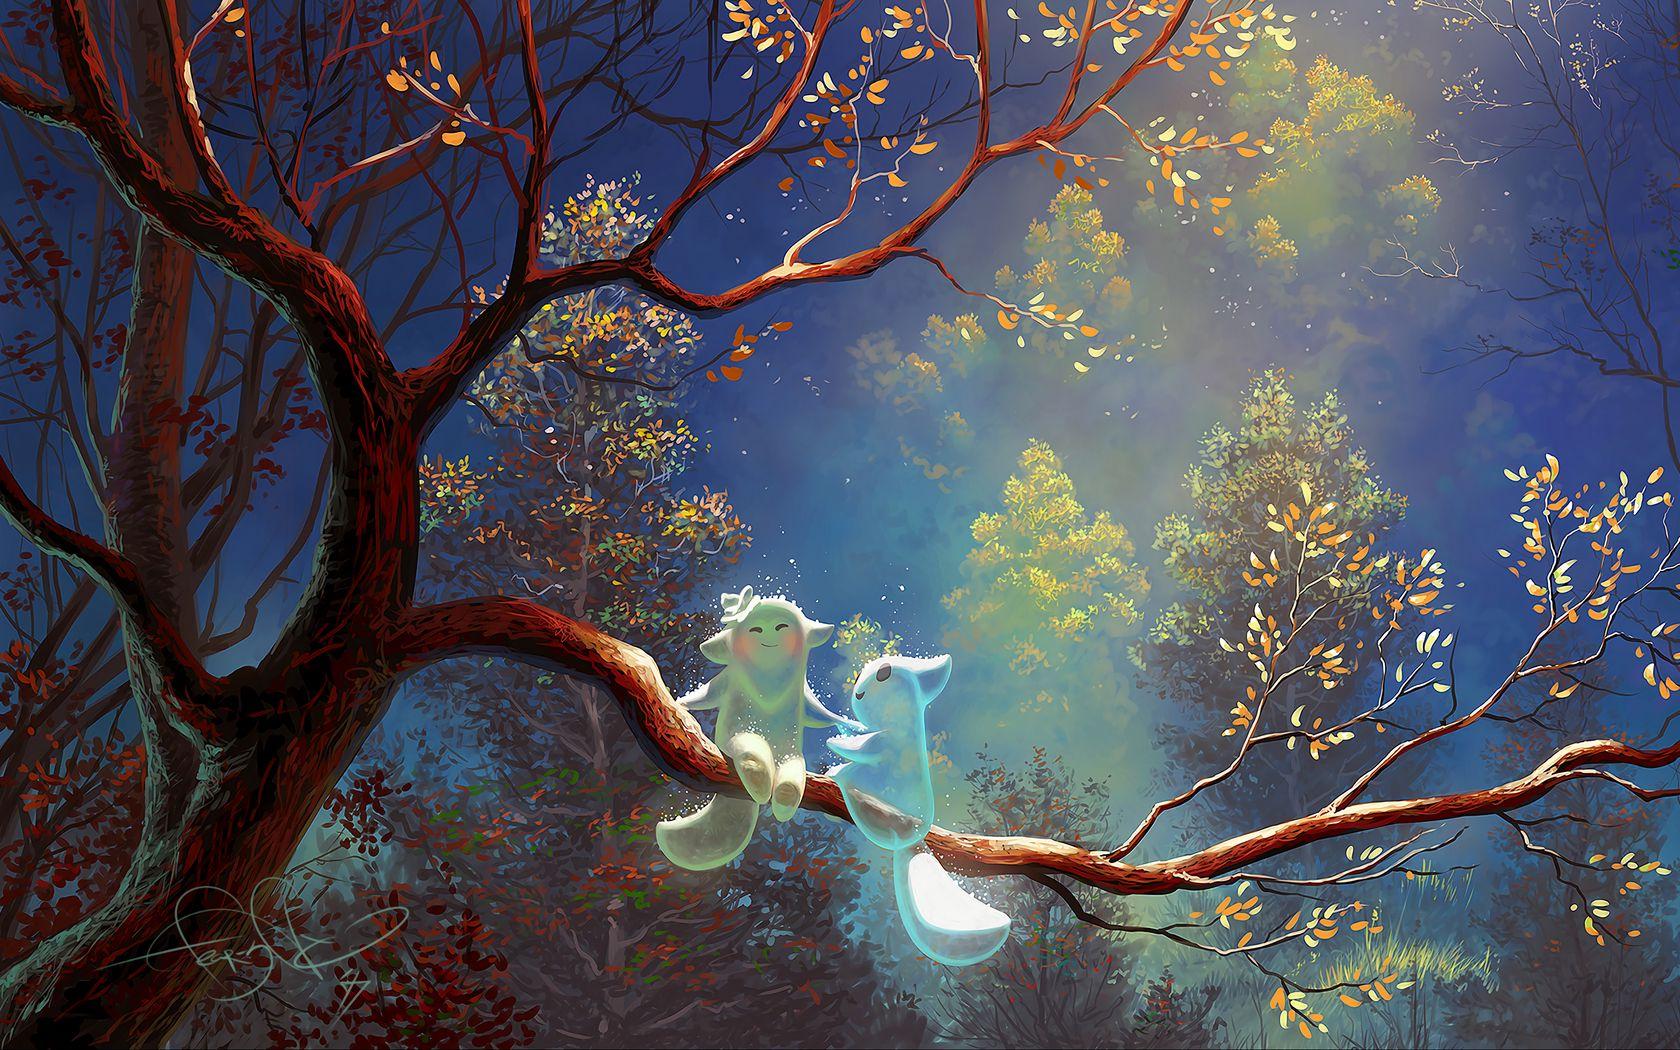 1680x1050 Wallpaper animals, tree, branch, magic, art, fantasy